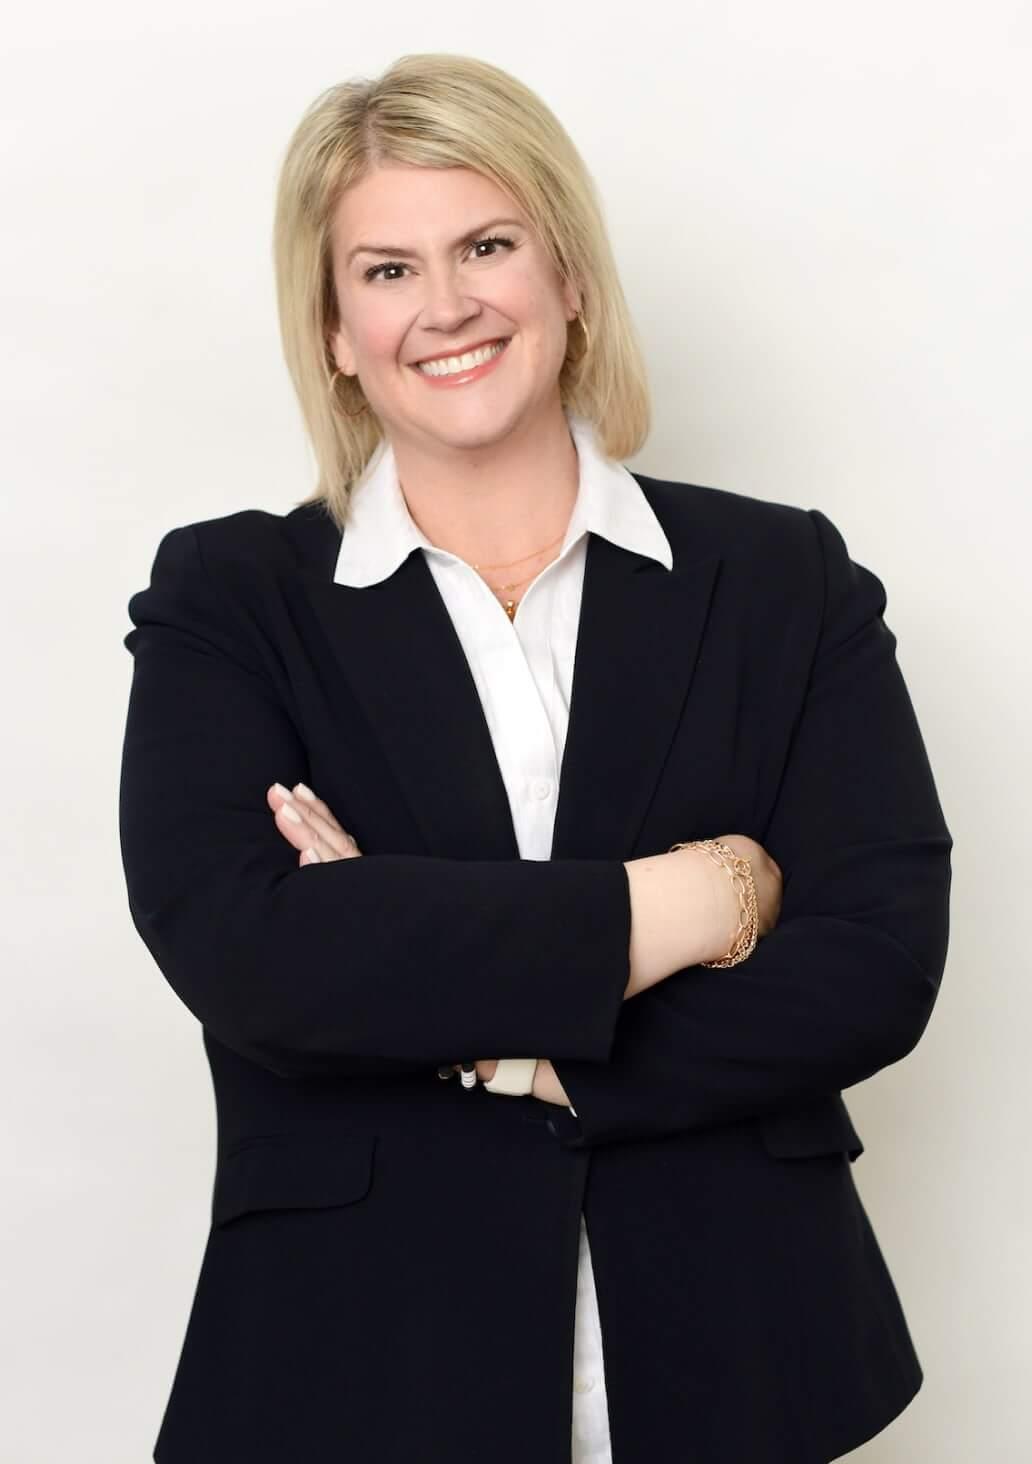 Nikki Kietzer